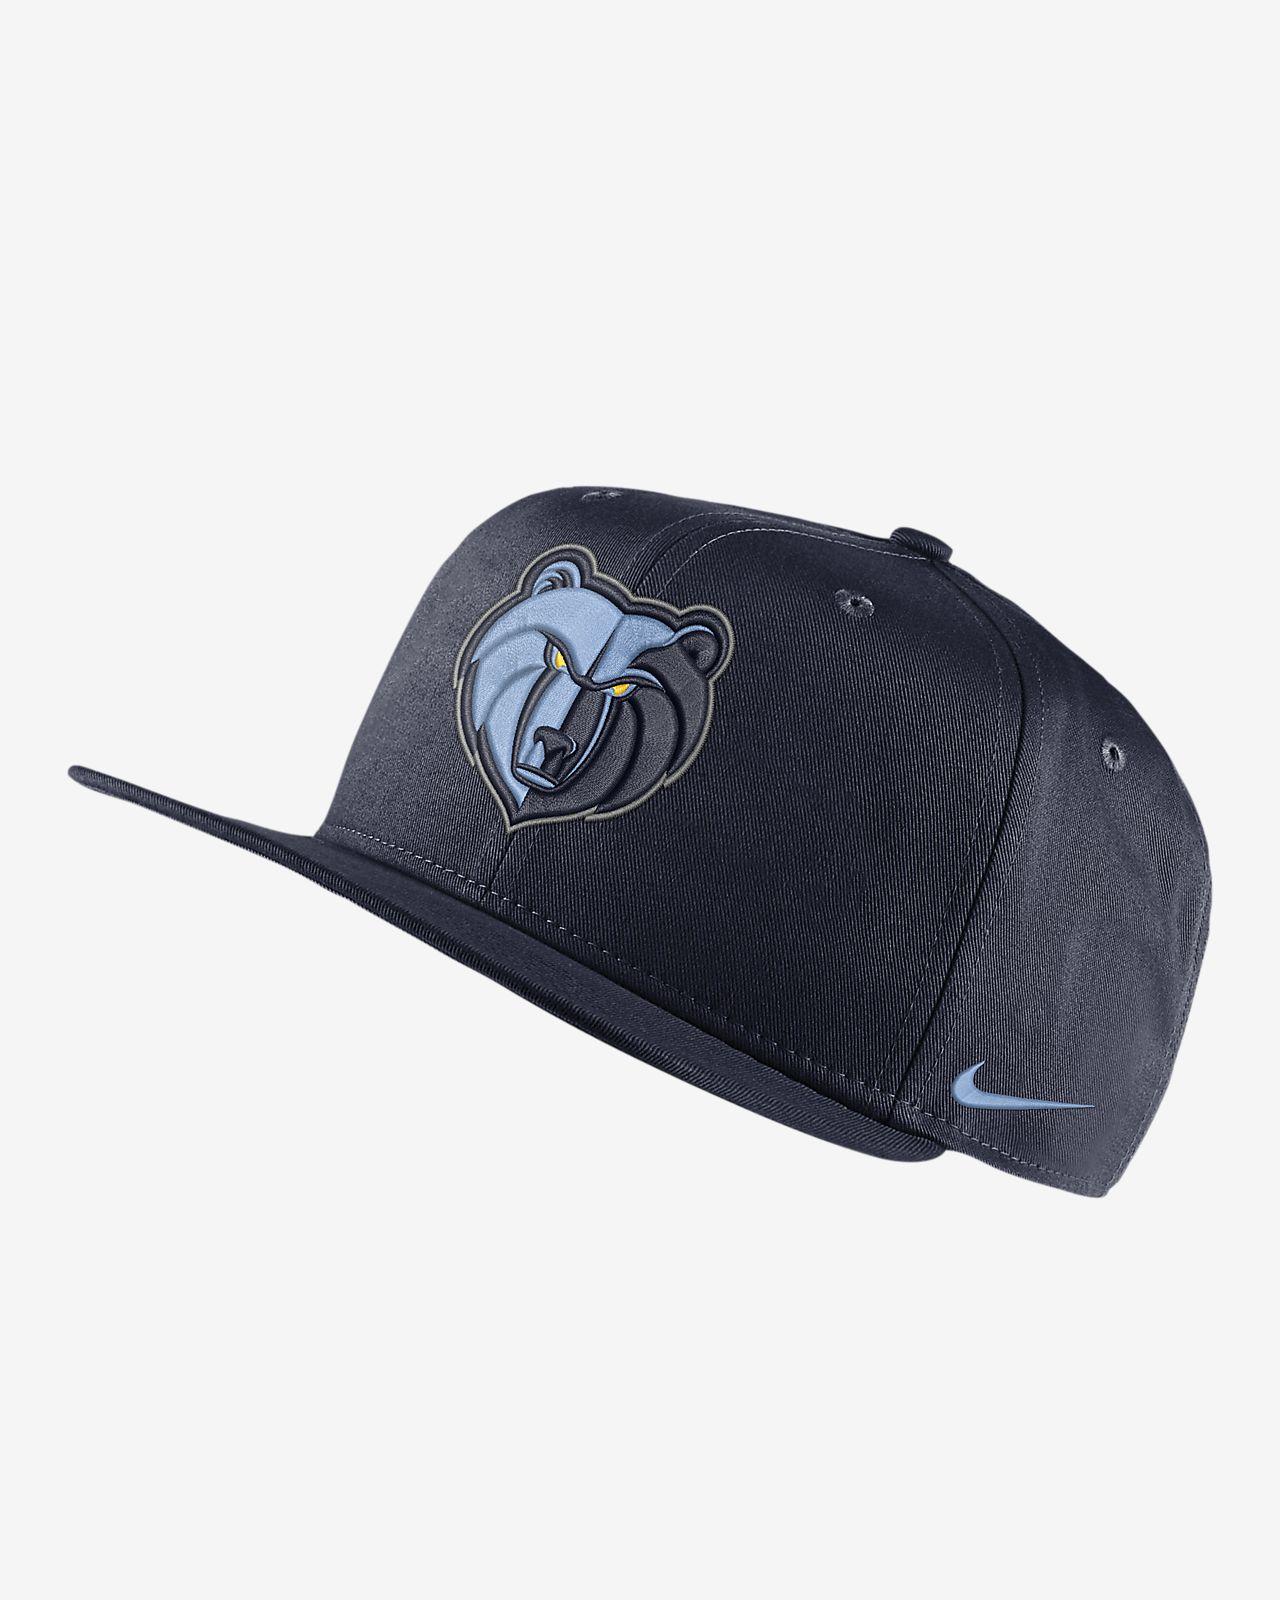 Memphis Grizzlies Nike Pro Gorra de l'NBA